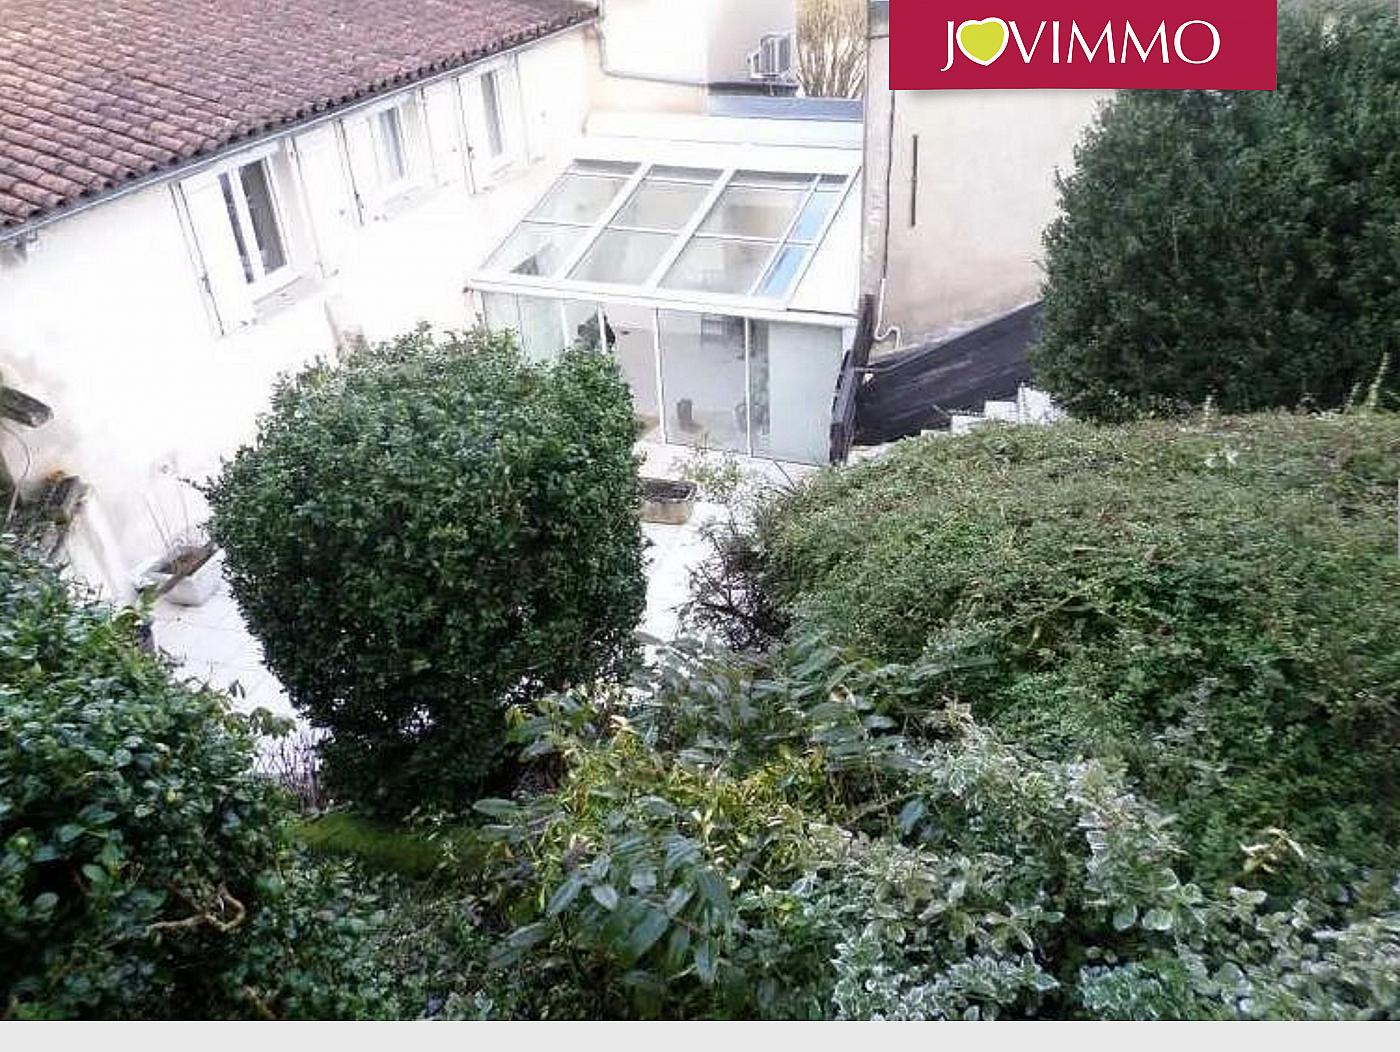 A Vendre Chauvigny - Maisons 4 Chambres + Bureau encequiconcerne Piscine Chauvigny